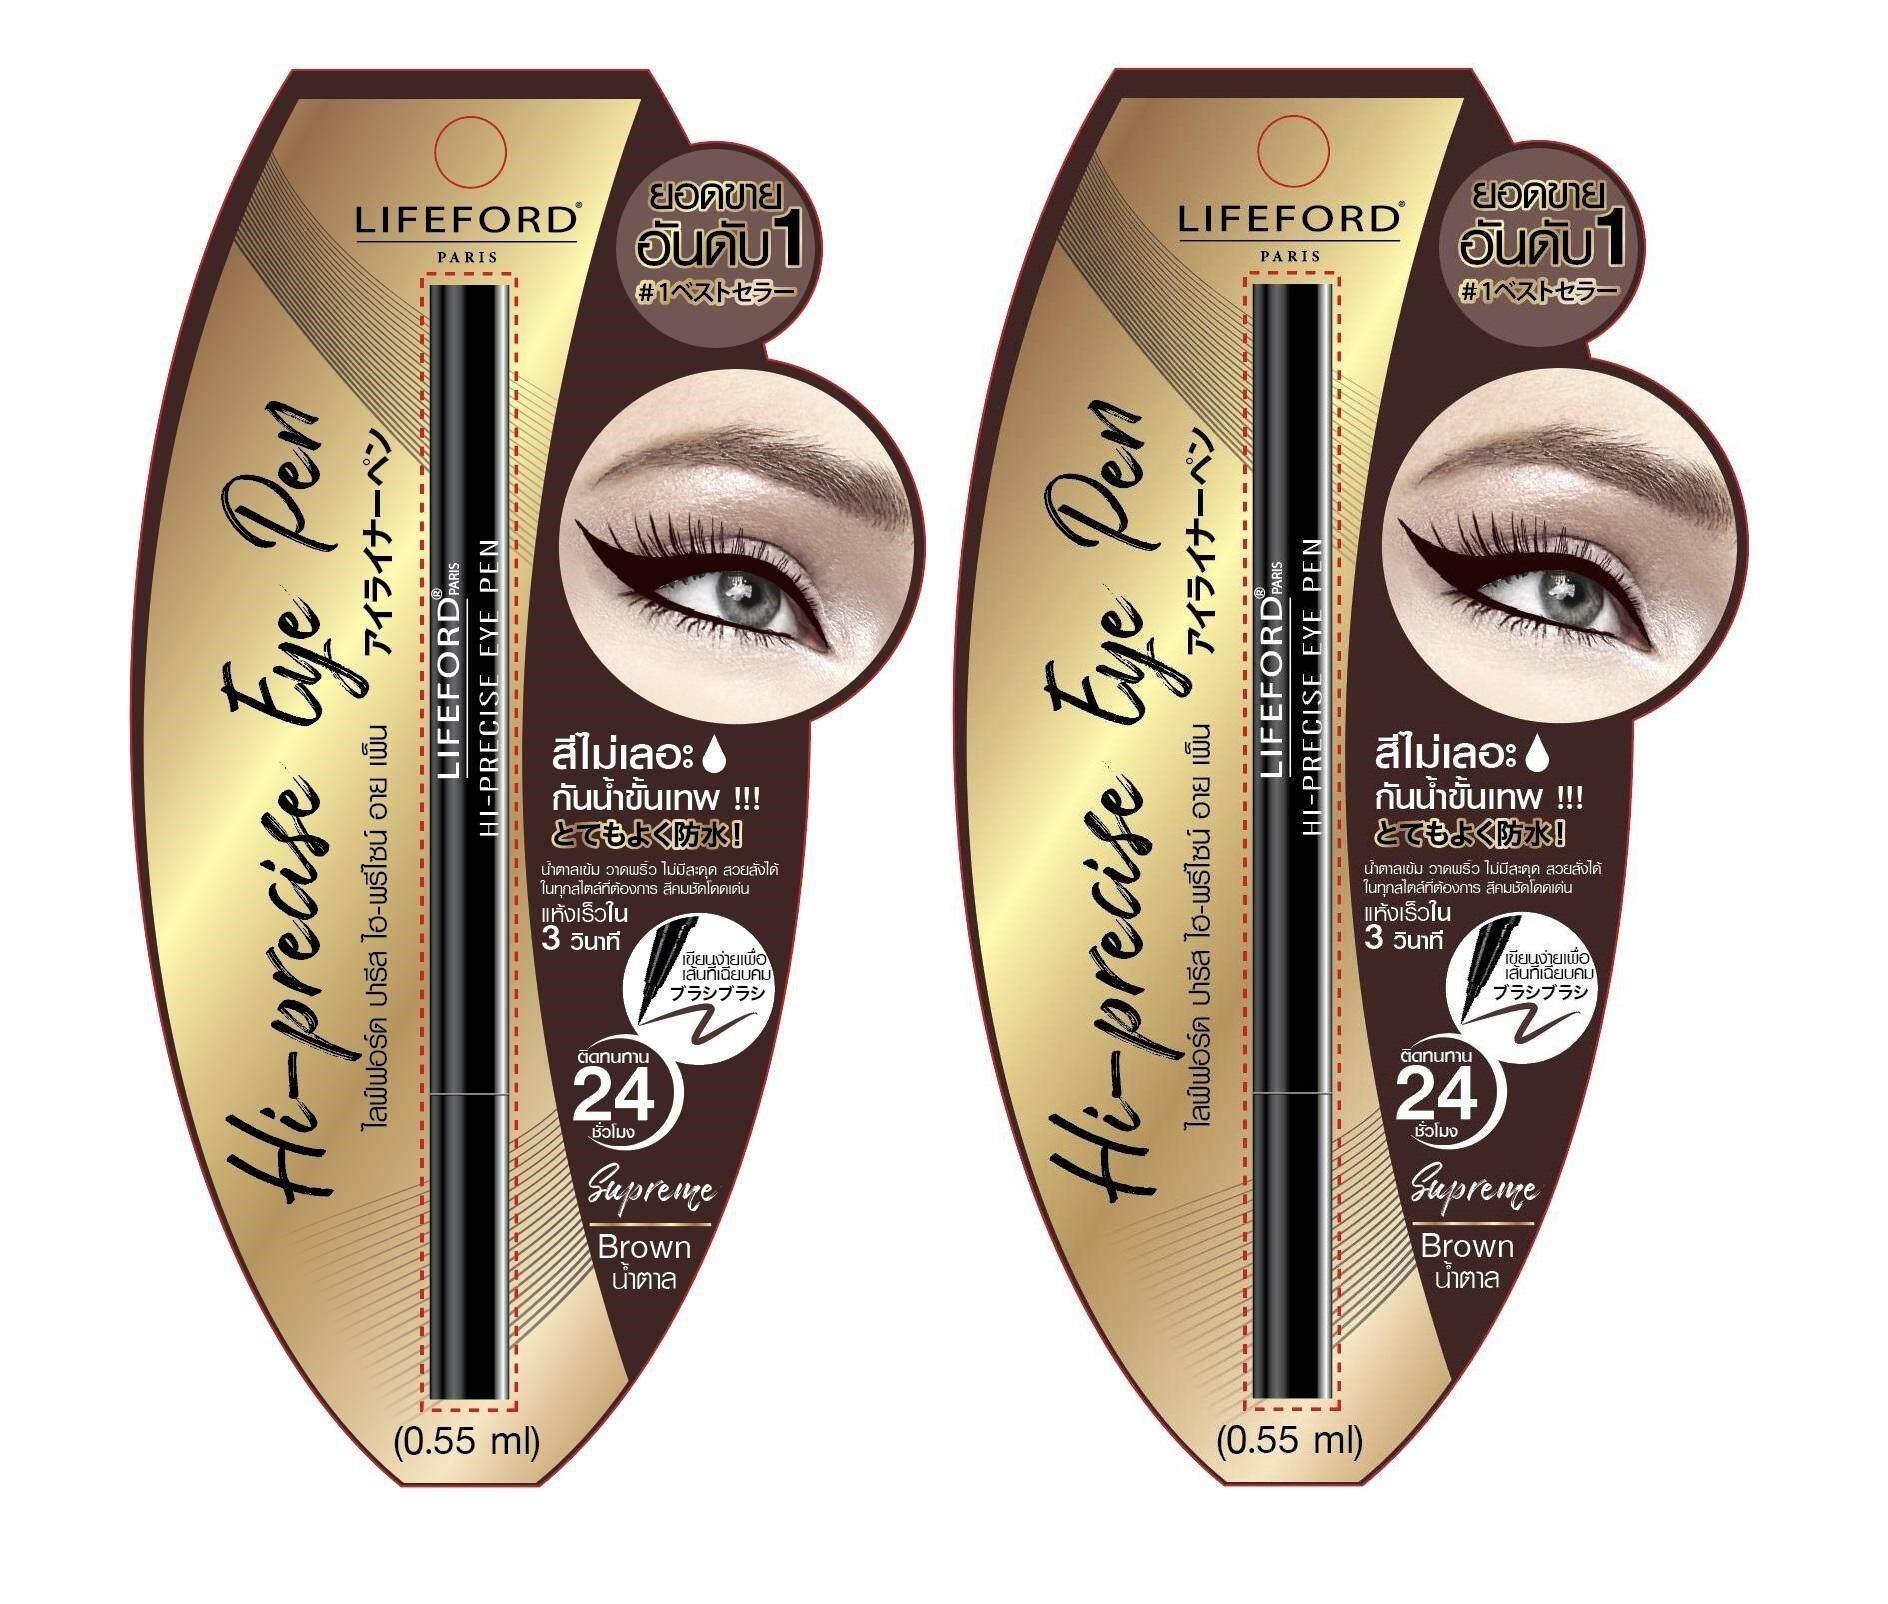 Lifeford Paris Eyeliner Hi-Precise Eye Pen(สีน้ำตาล2แท่ง).